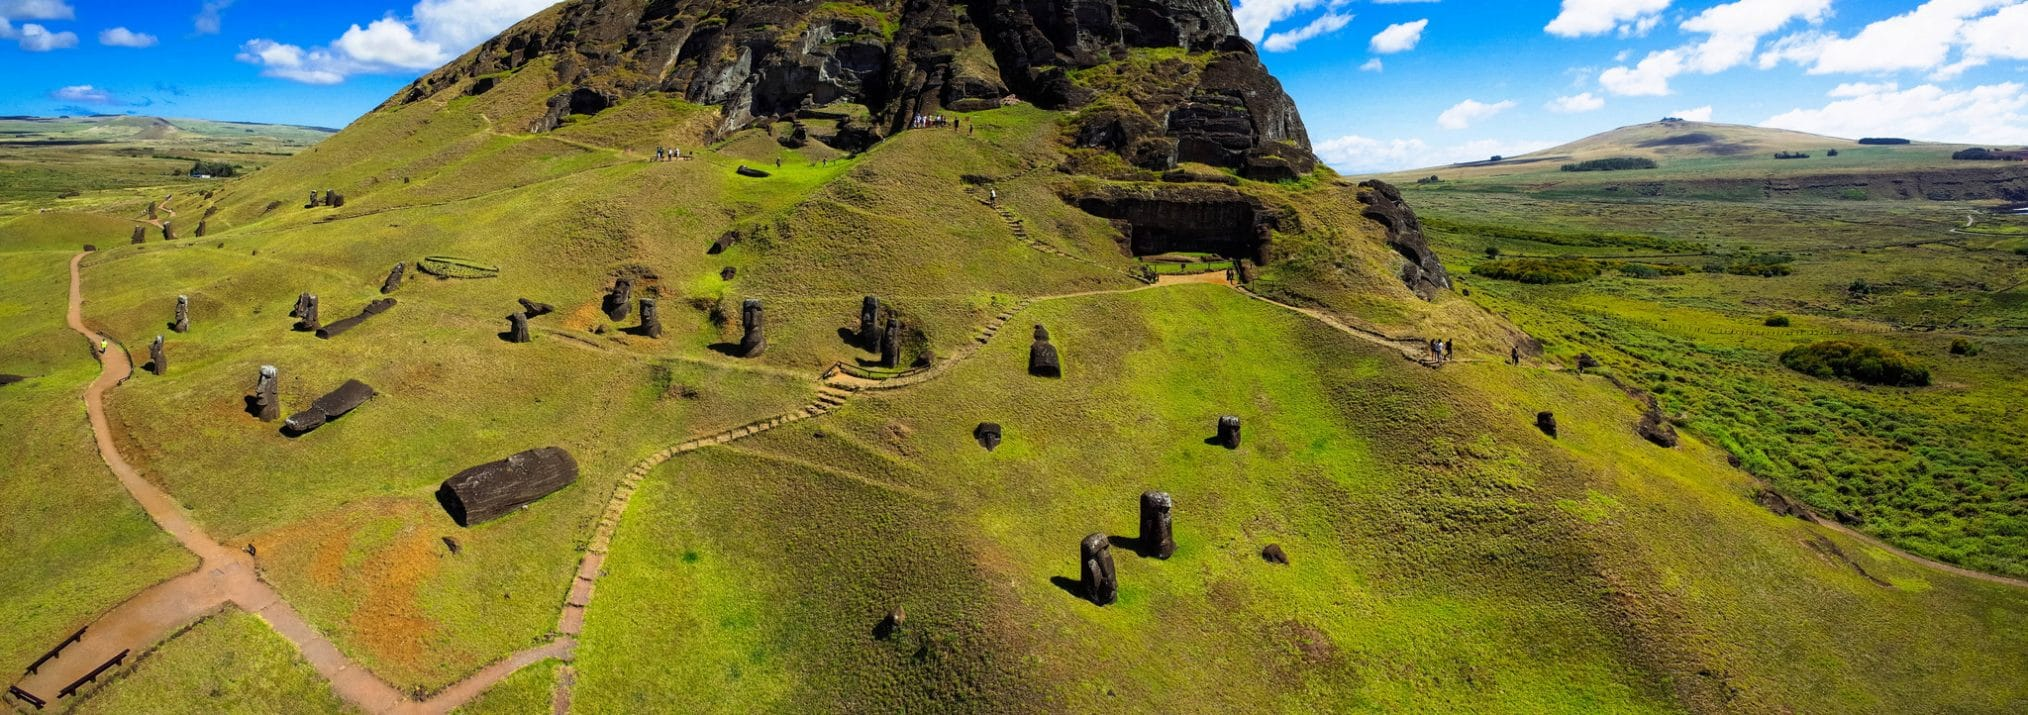 Easter Island - Rano Raraku National Park